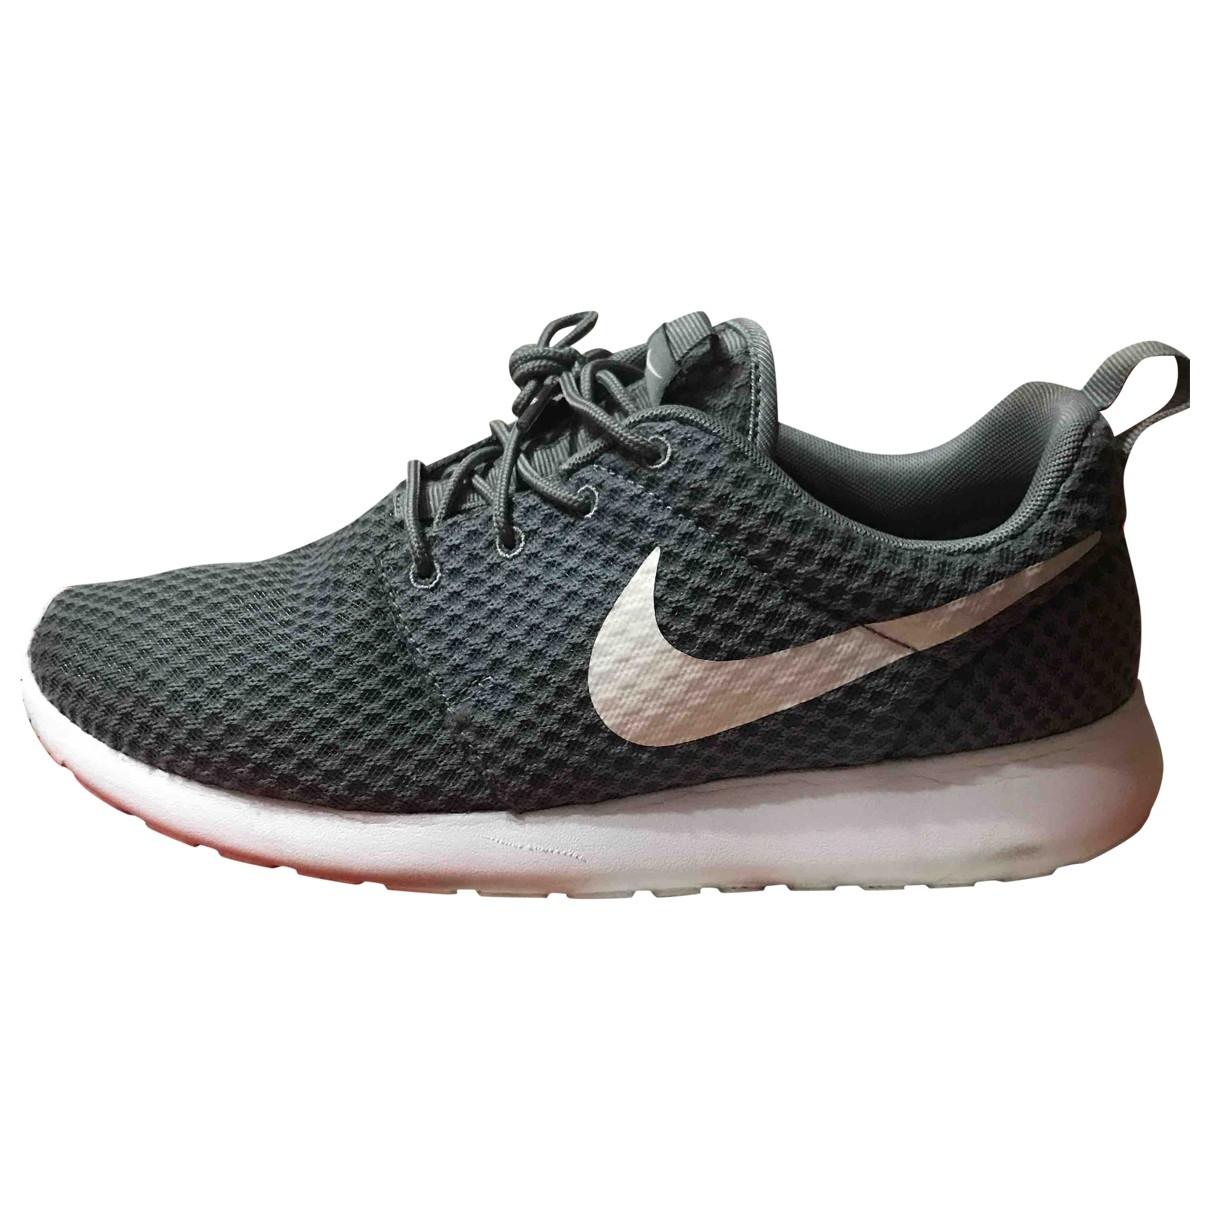 Nike - Baskets Roshe Run pour homme en toile - gris